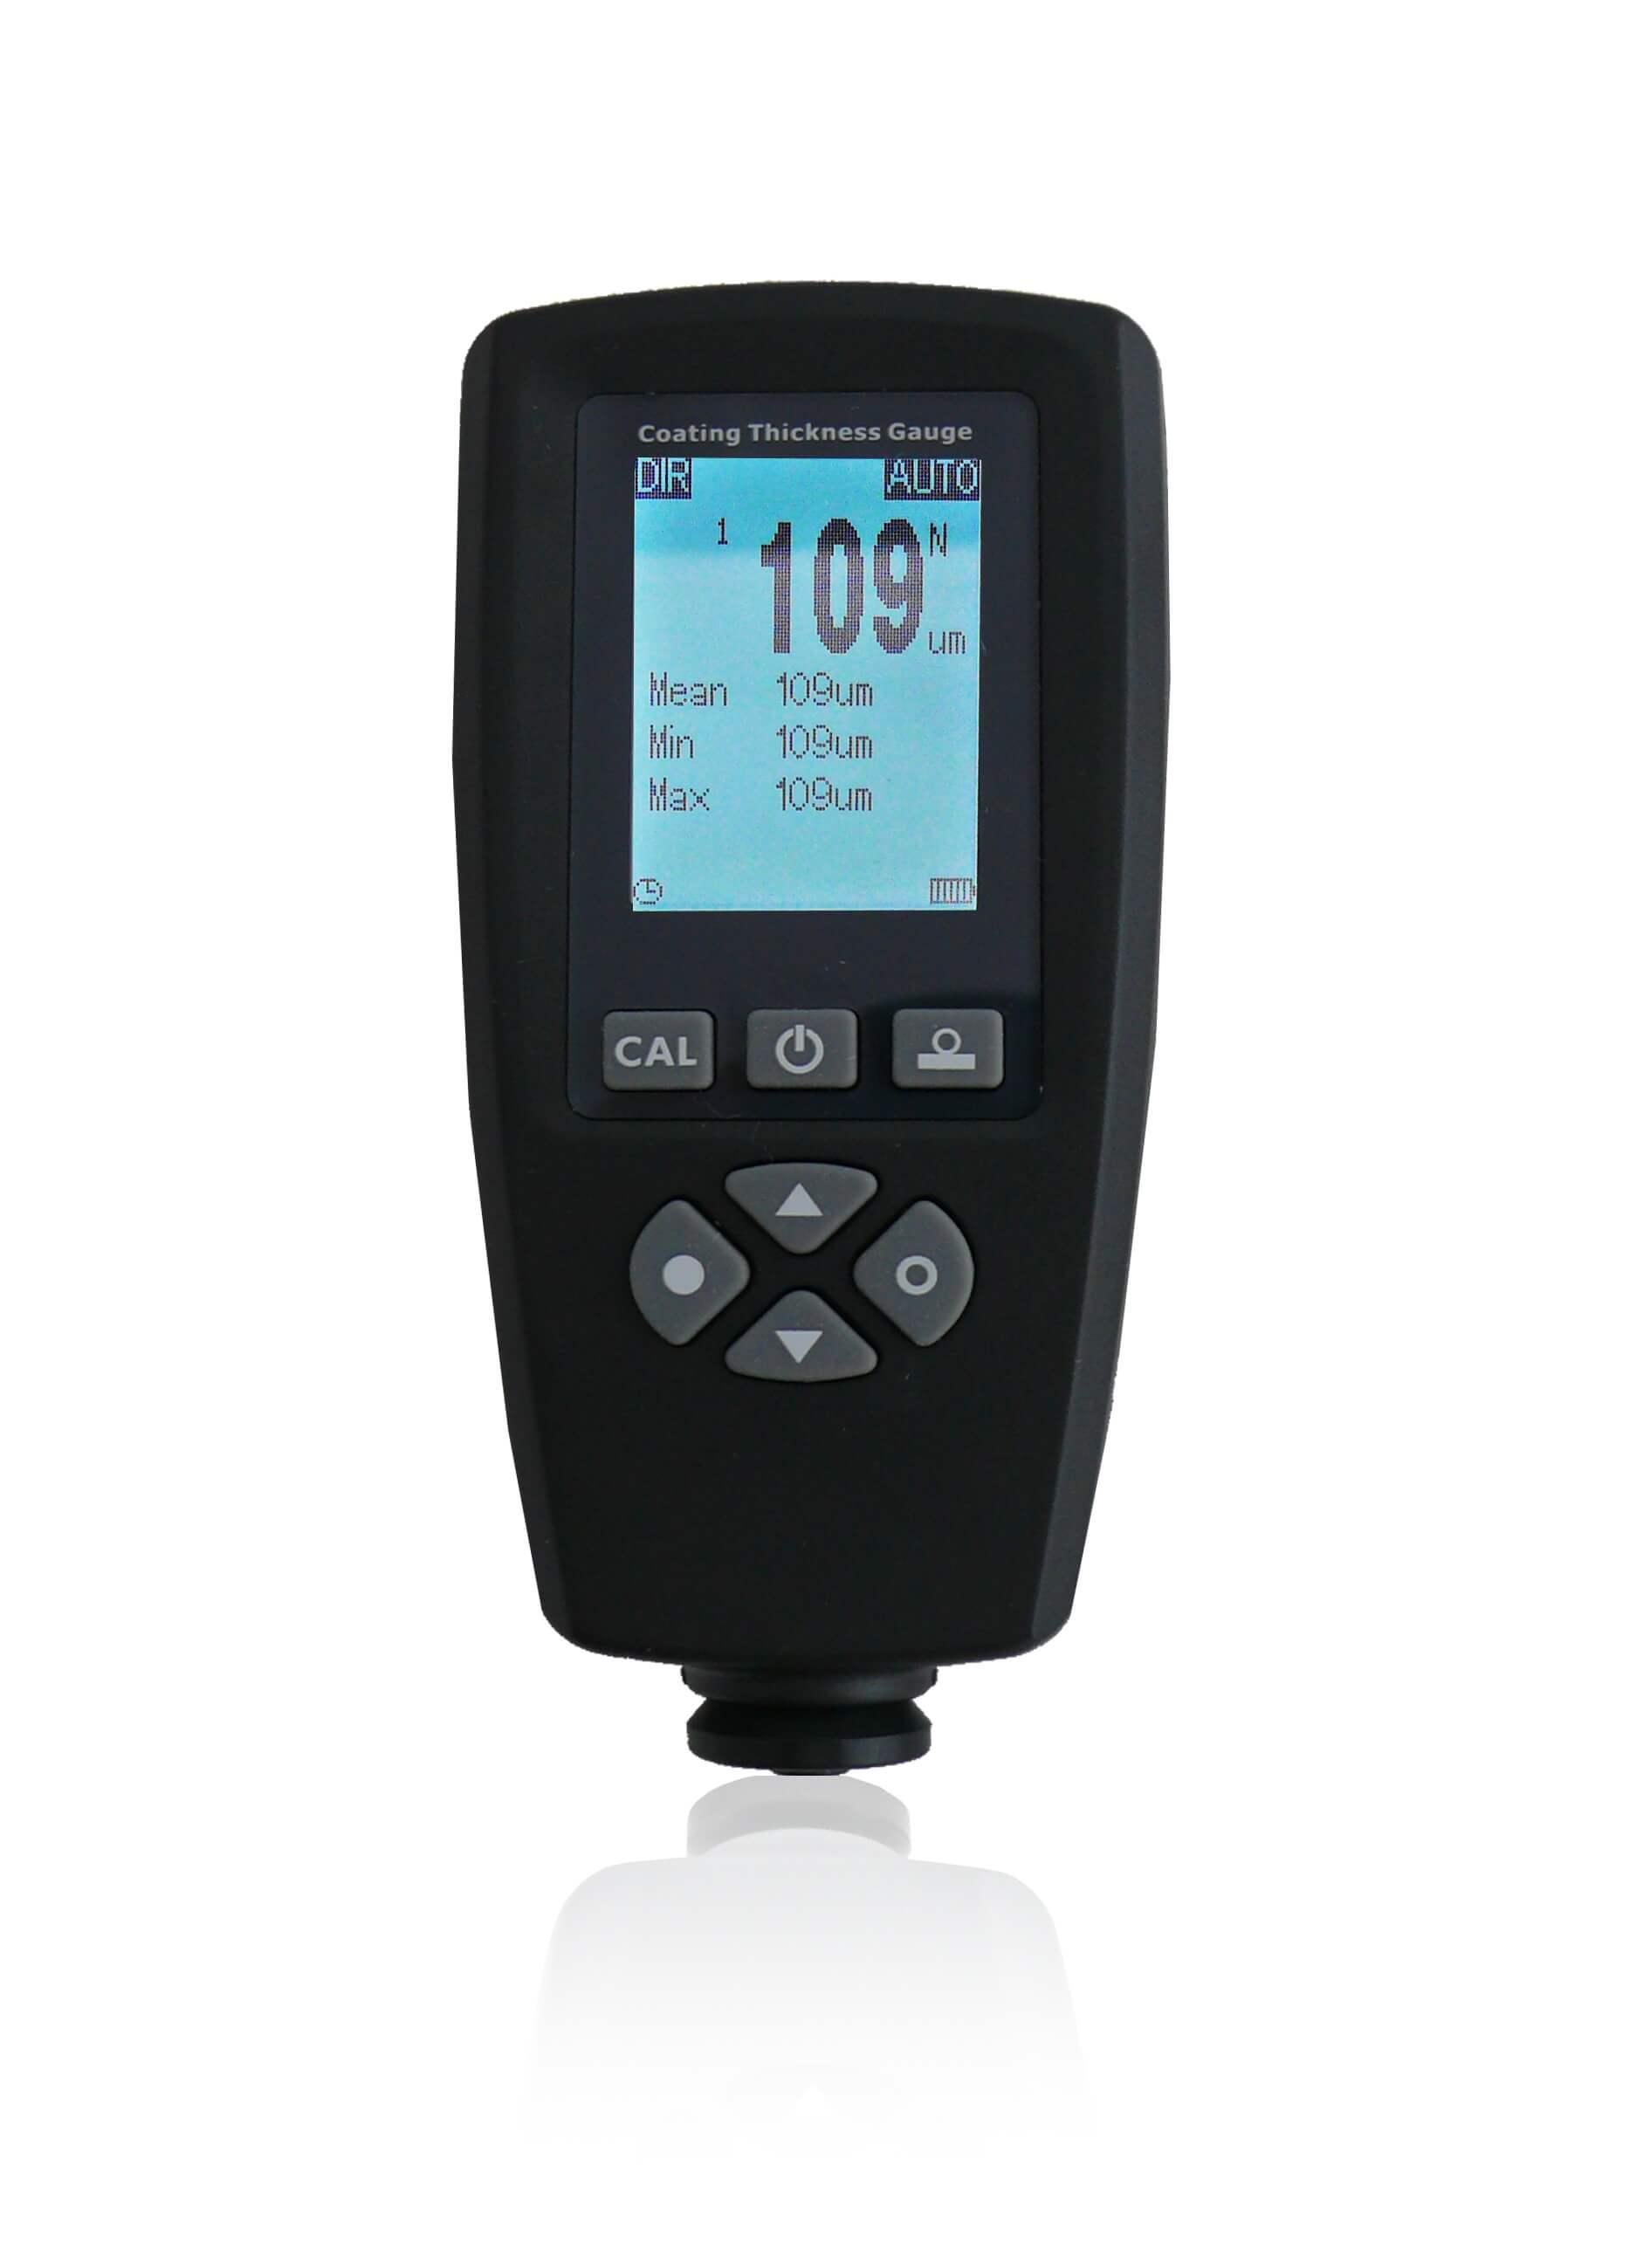 DT-530 – Coating thickness gauge